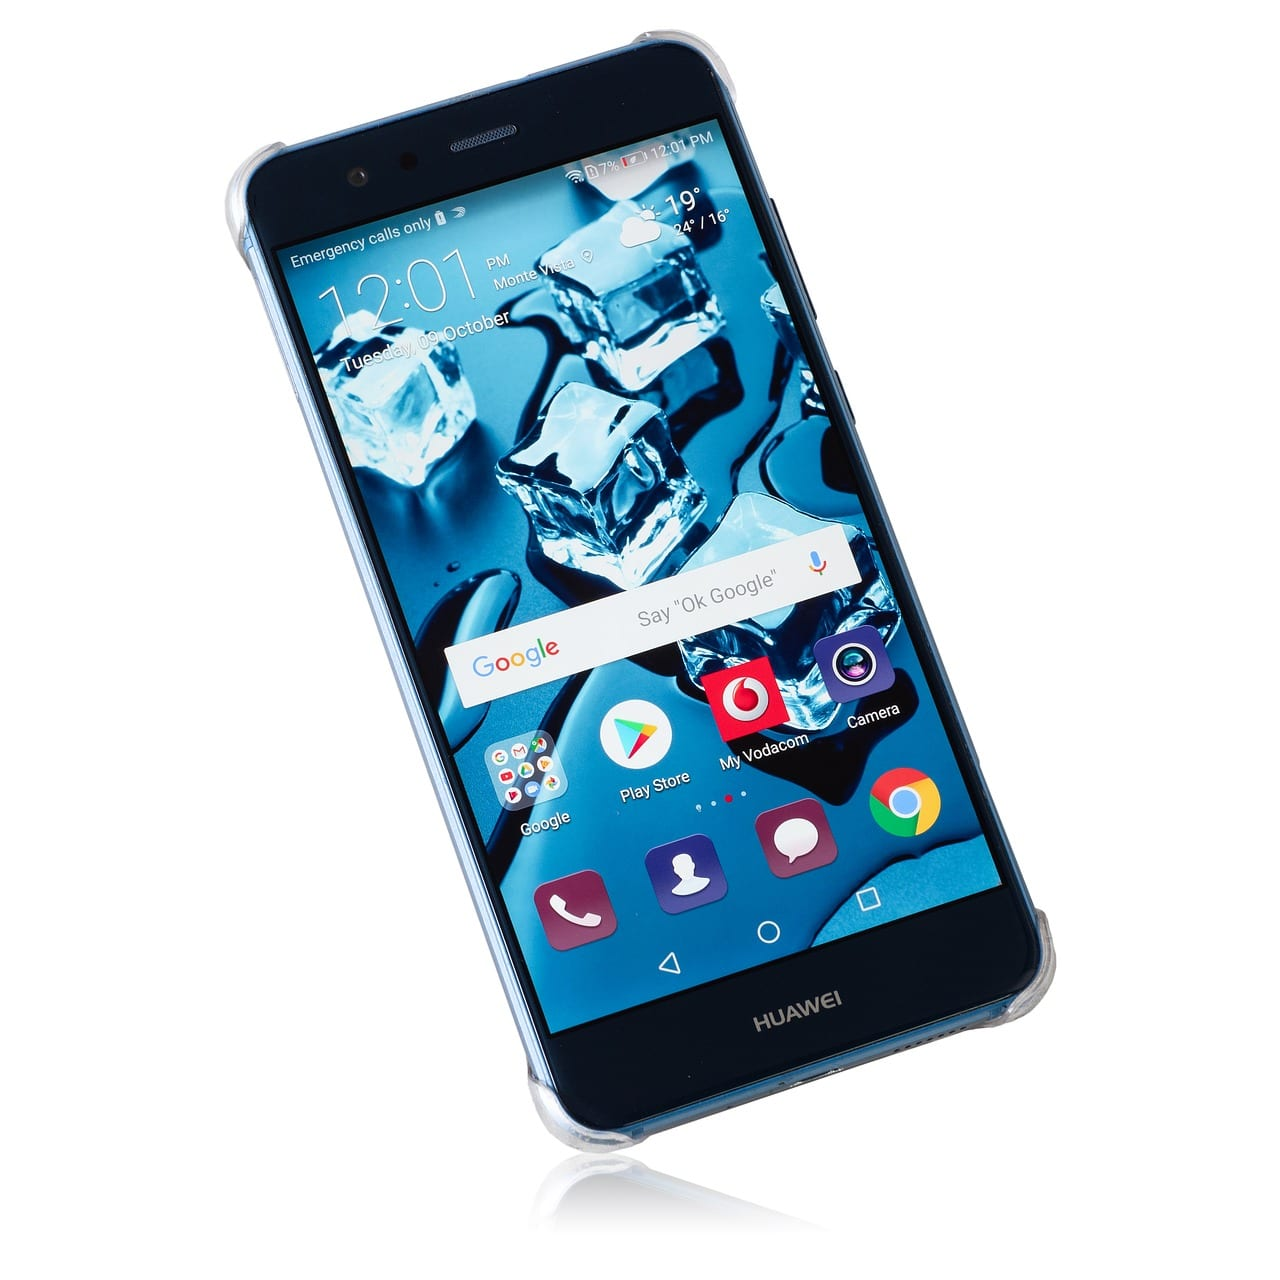 Huawei Handset